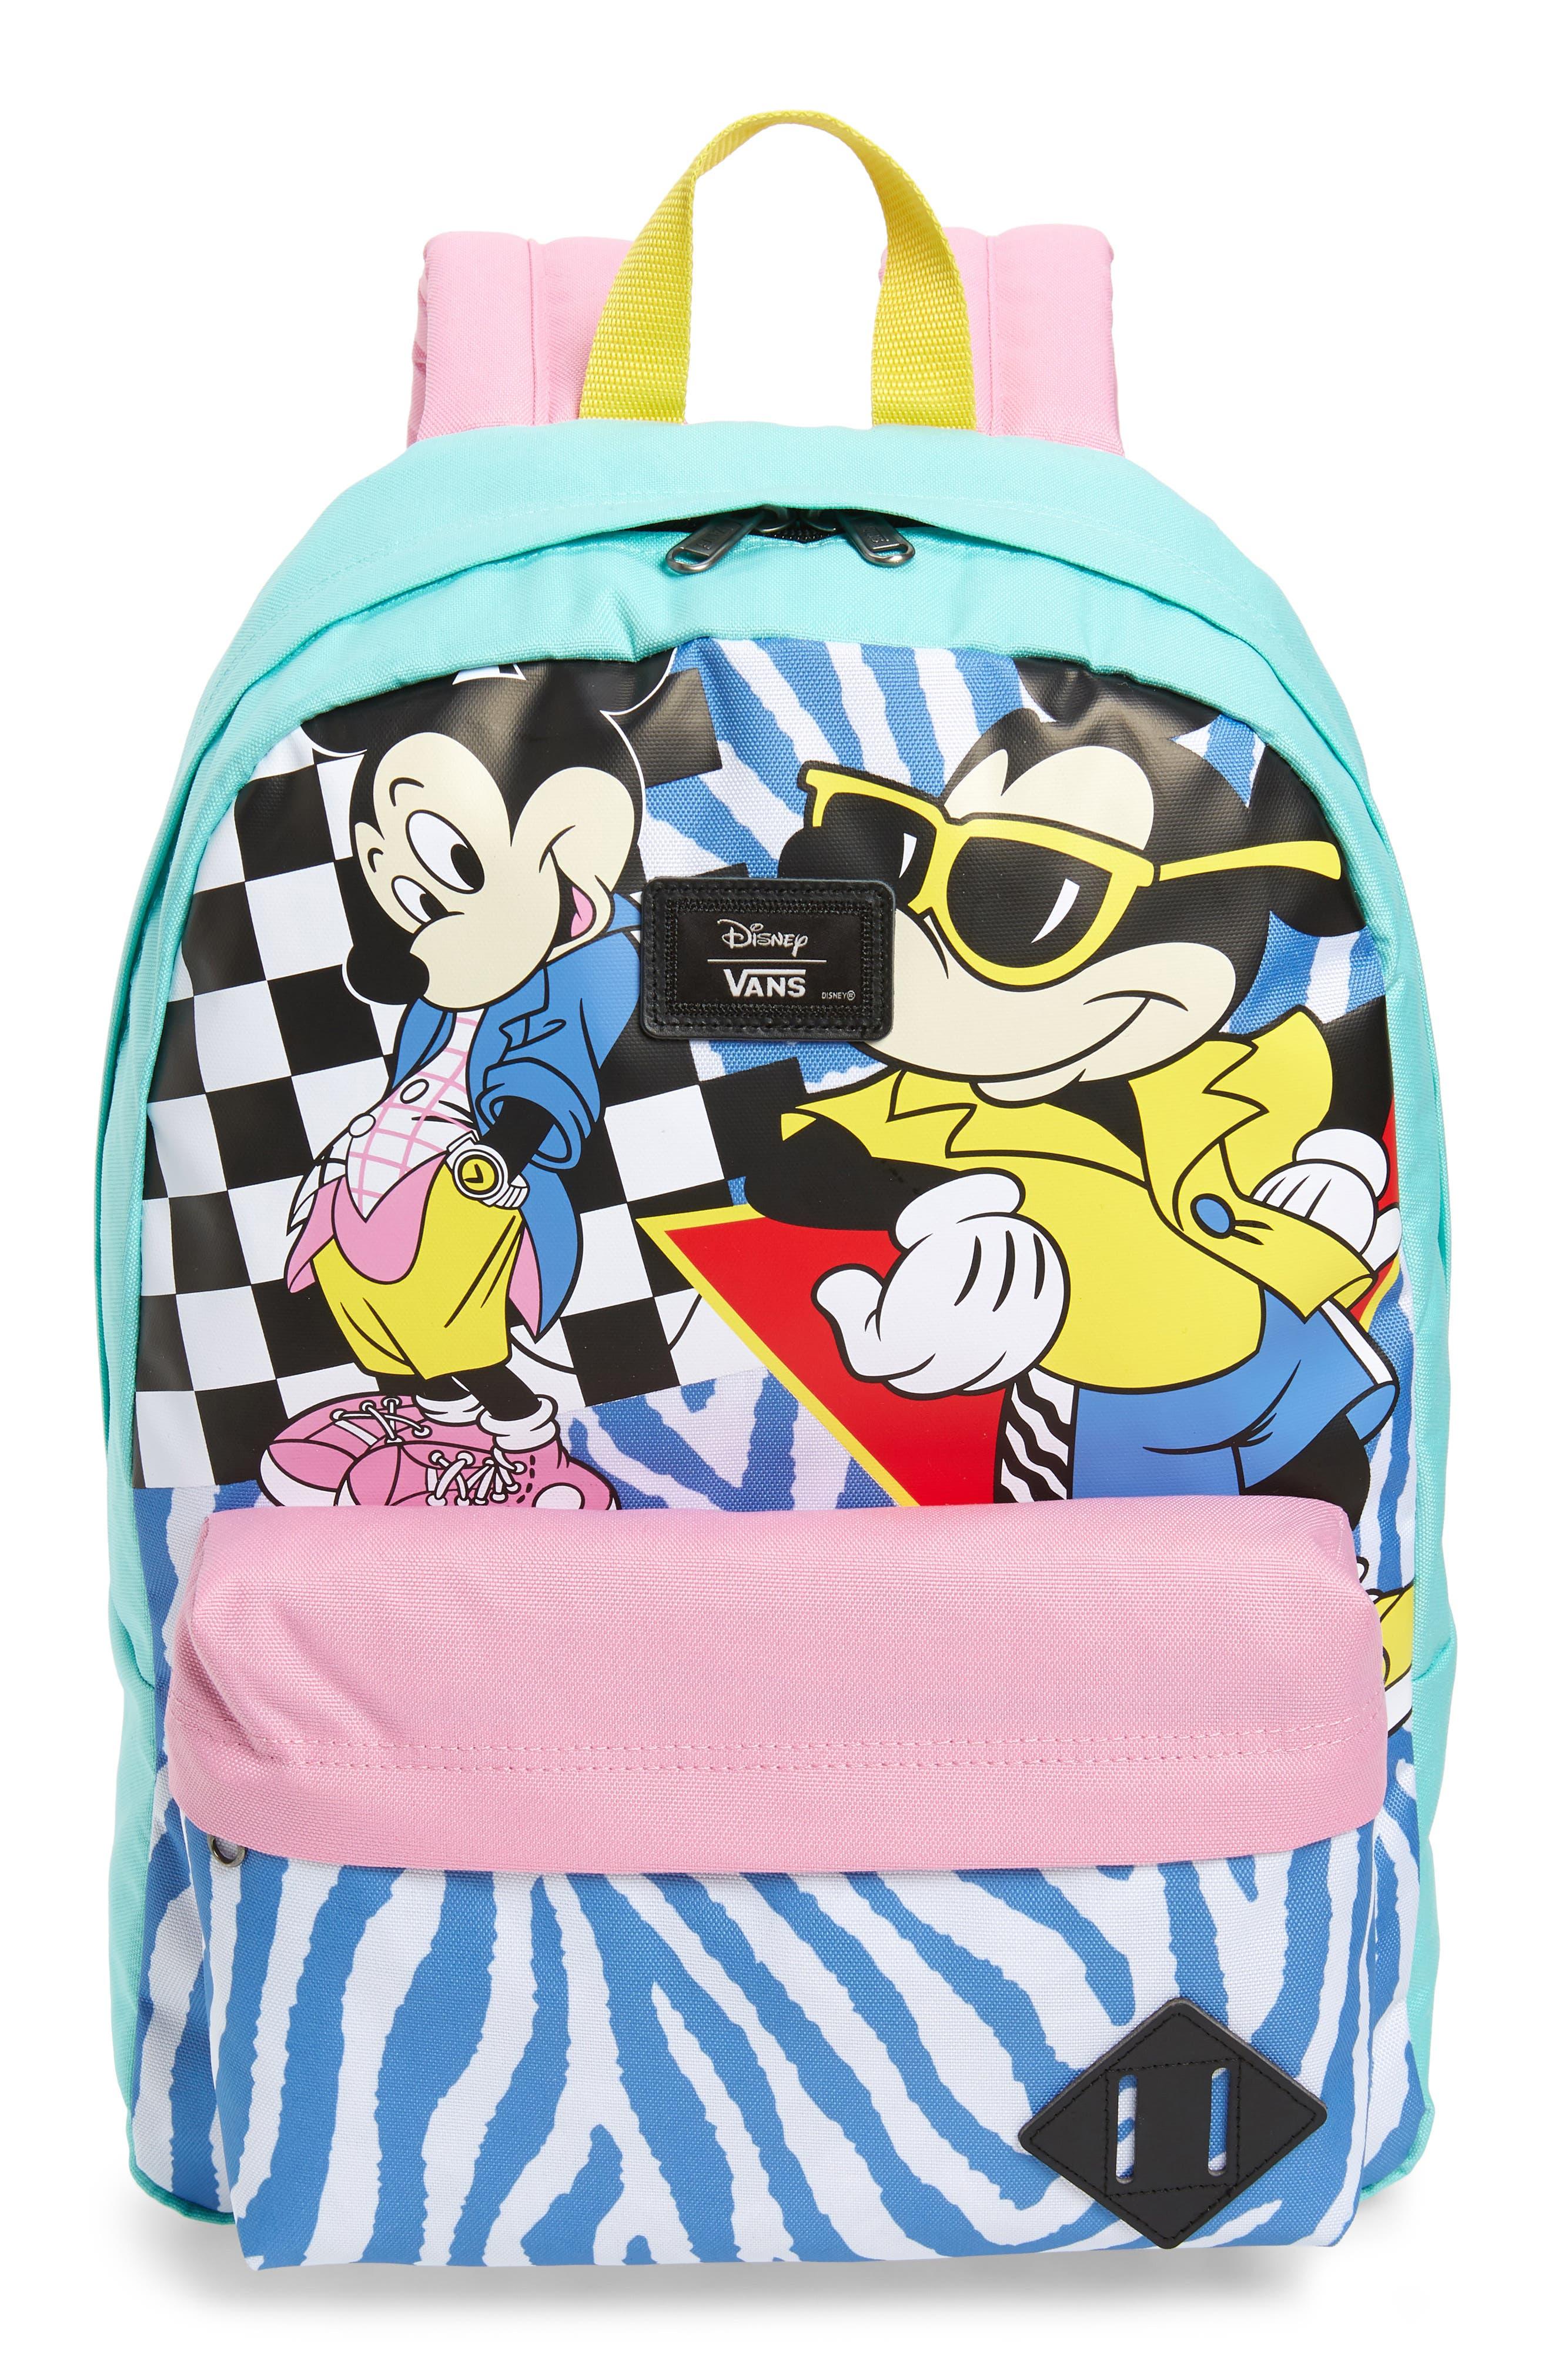 x Disney Mickey's 90th Anniversary - Retro Backpack,                             Main thumbnail 1, color,                             400